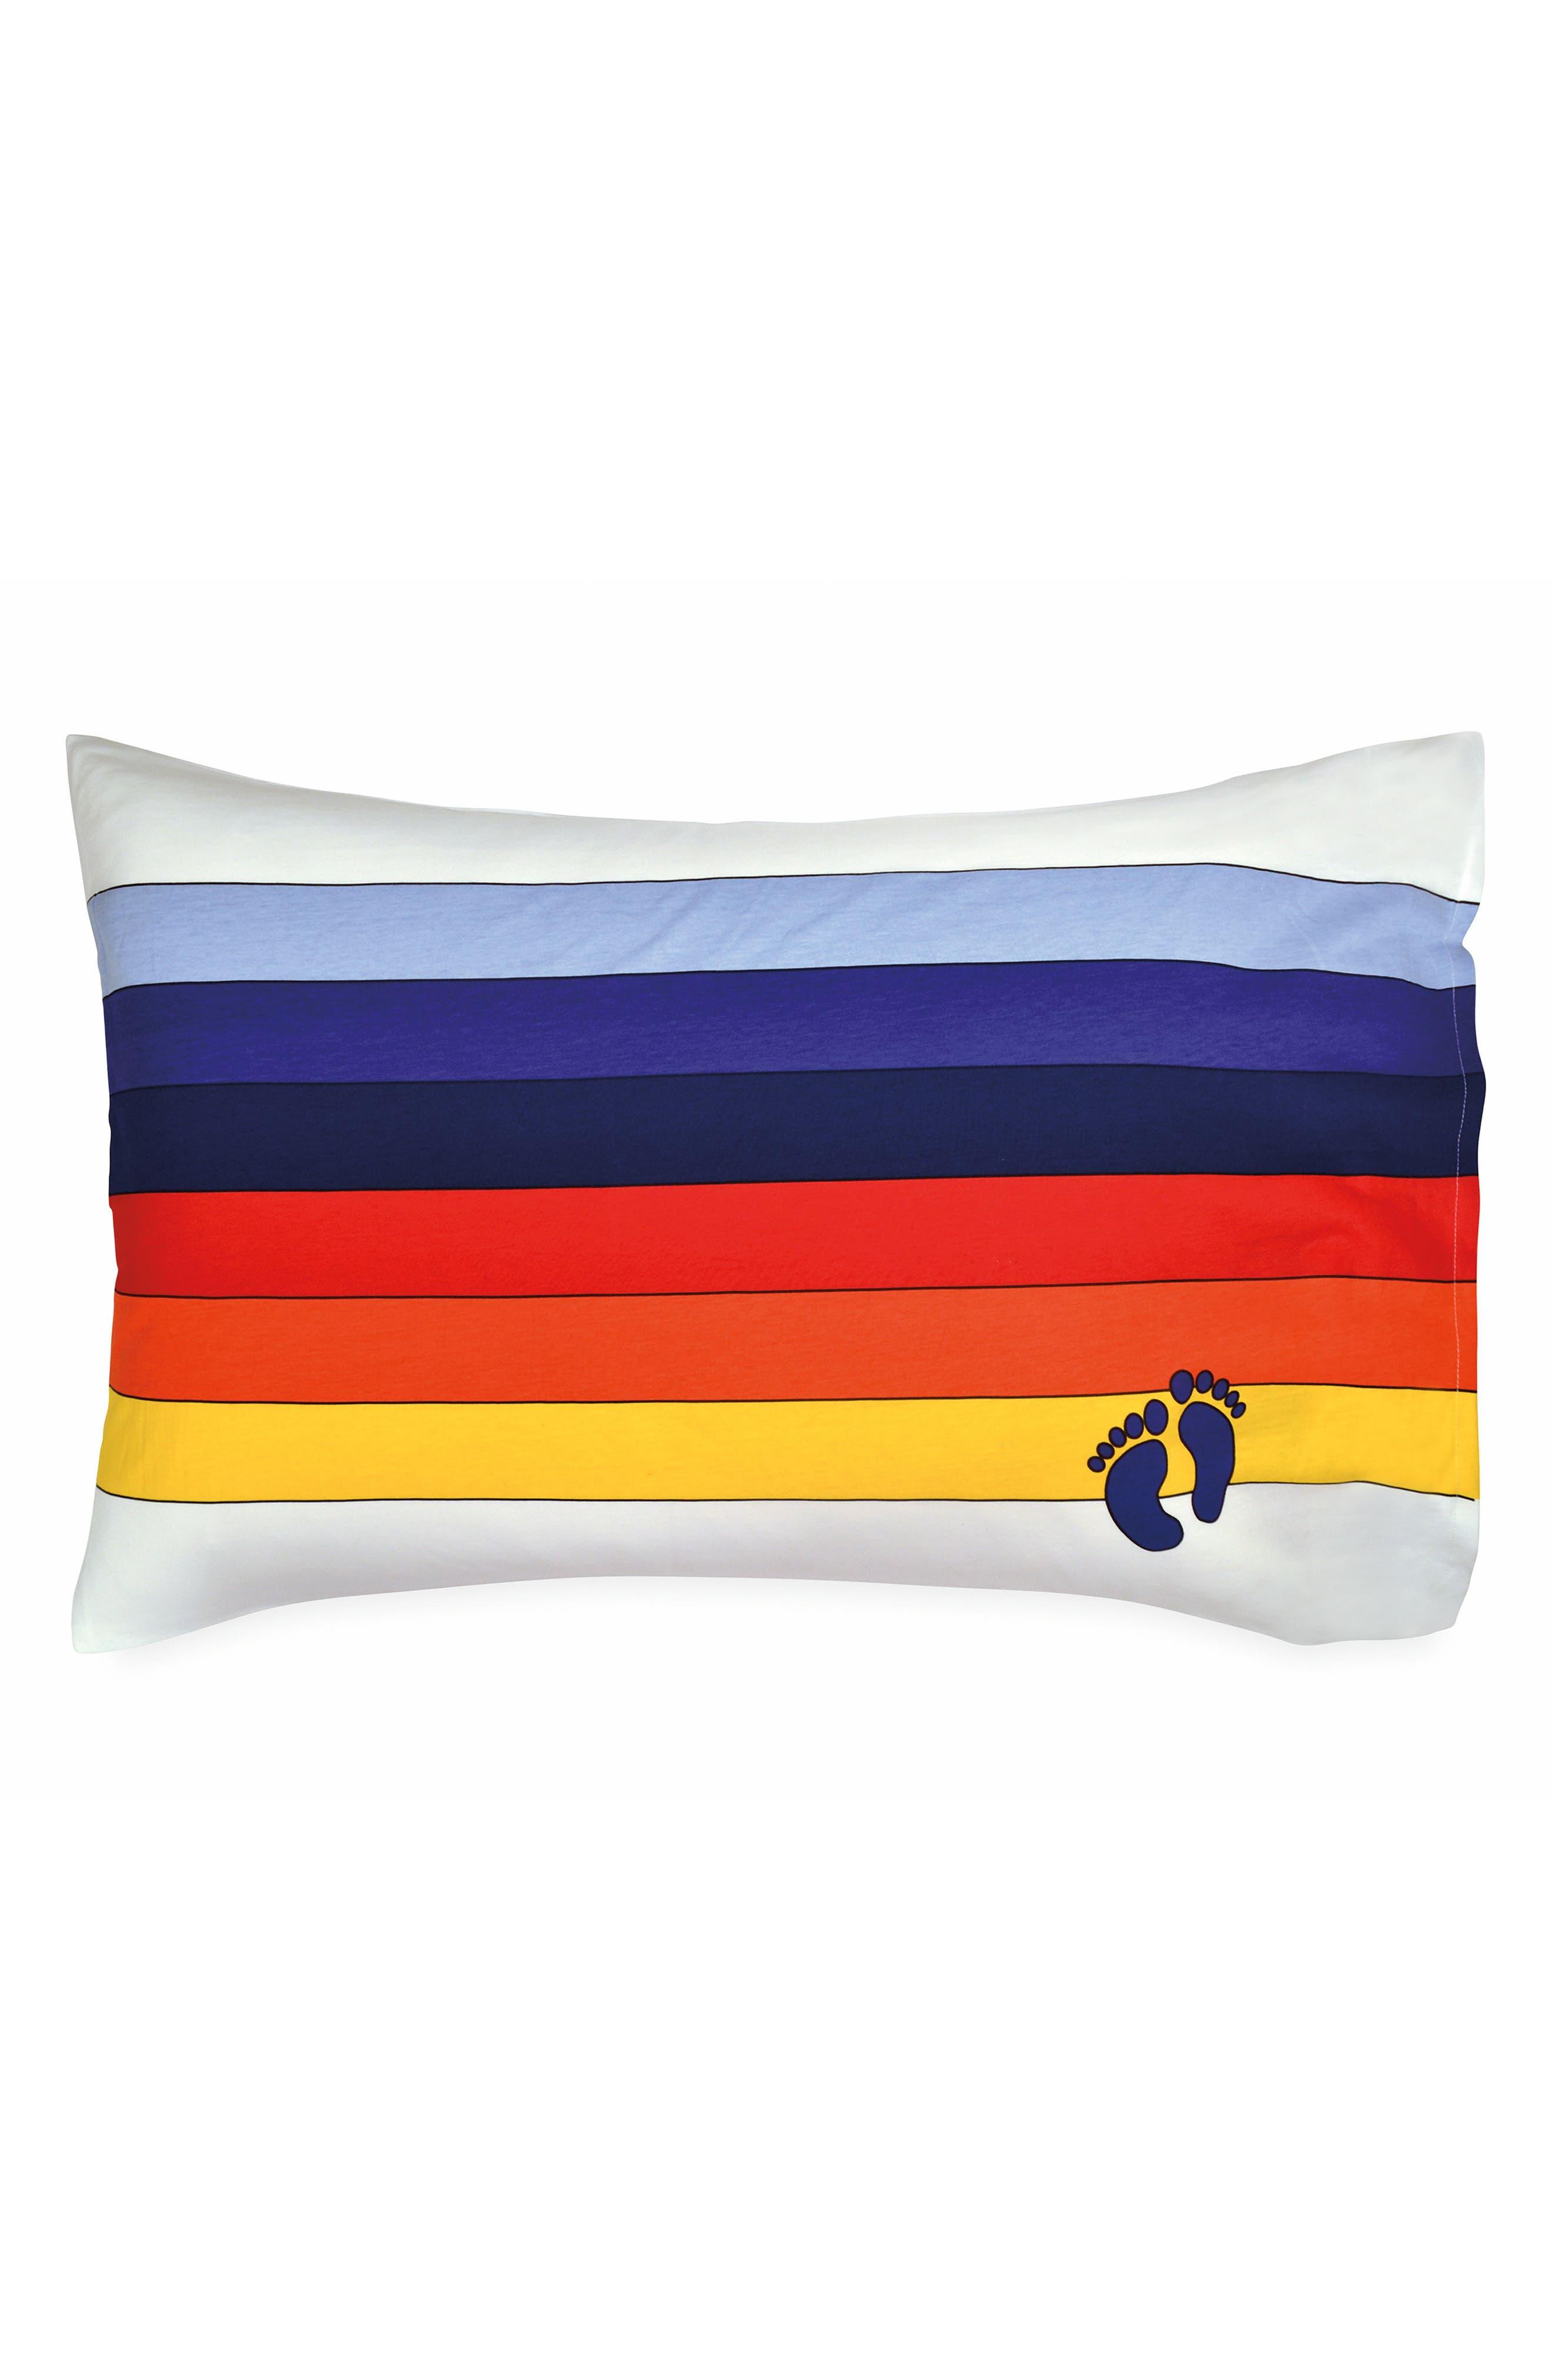 Rainbow Pillowcase,                         Main,                         color, White